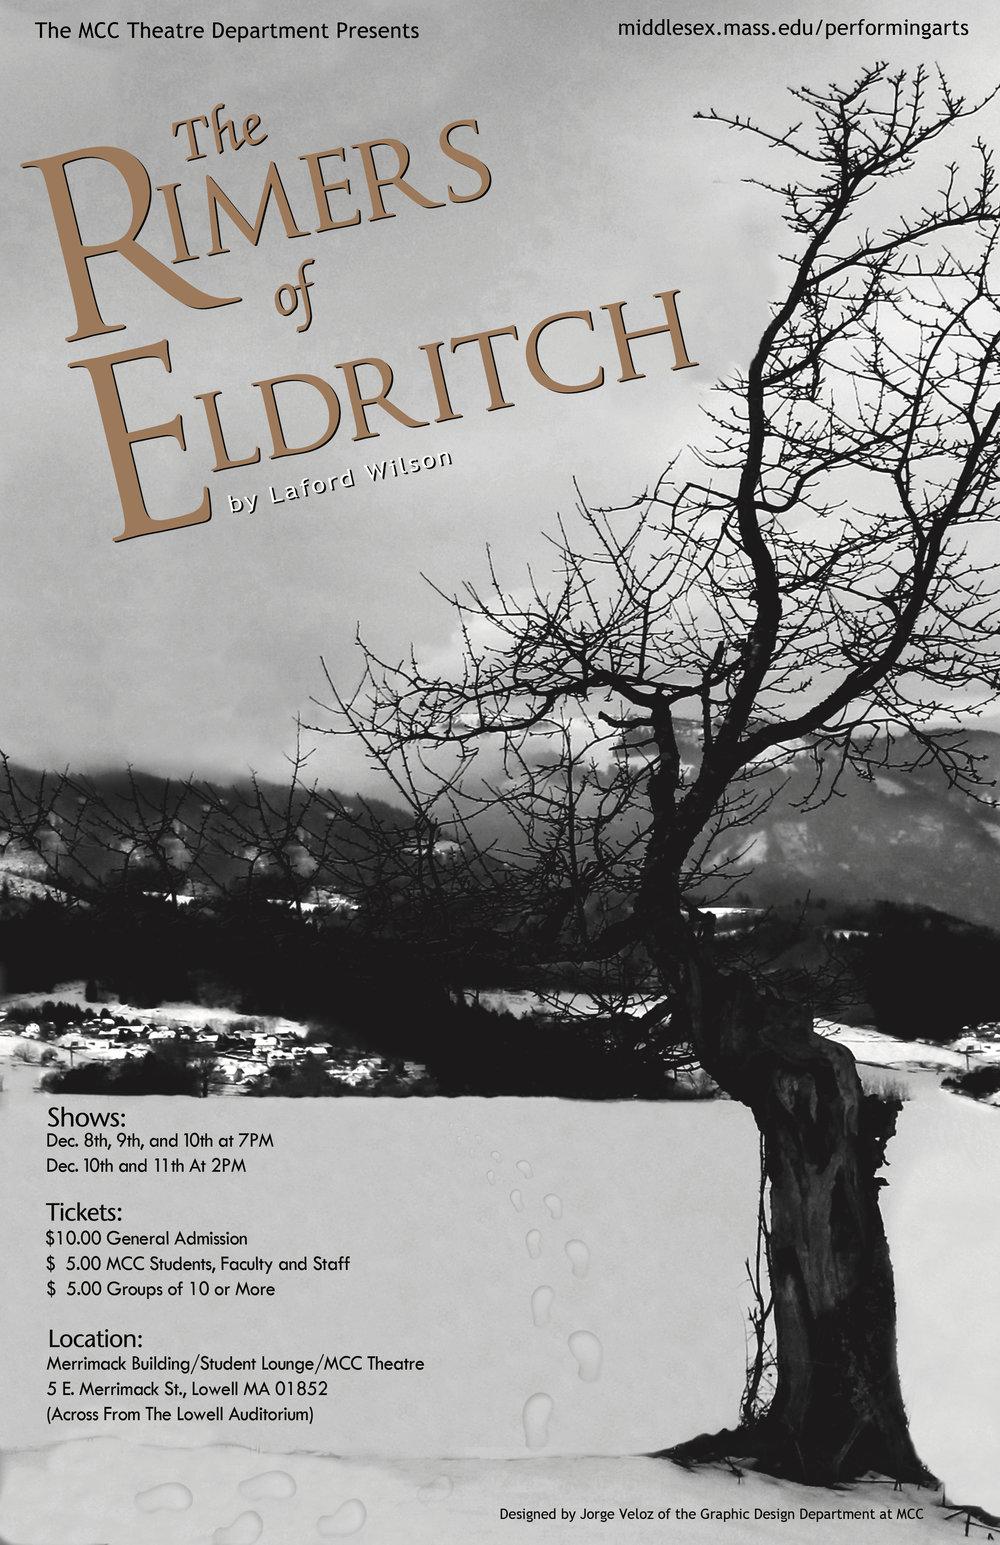 The_Rimers_of_Eldritch.jpg